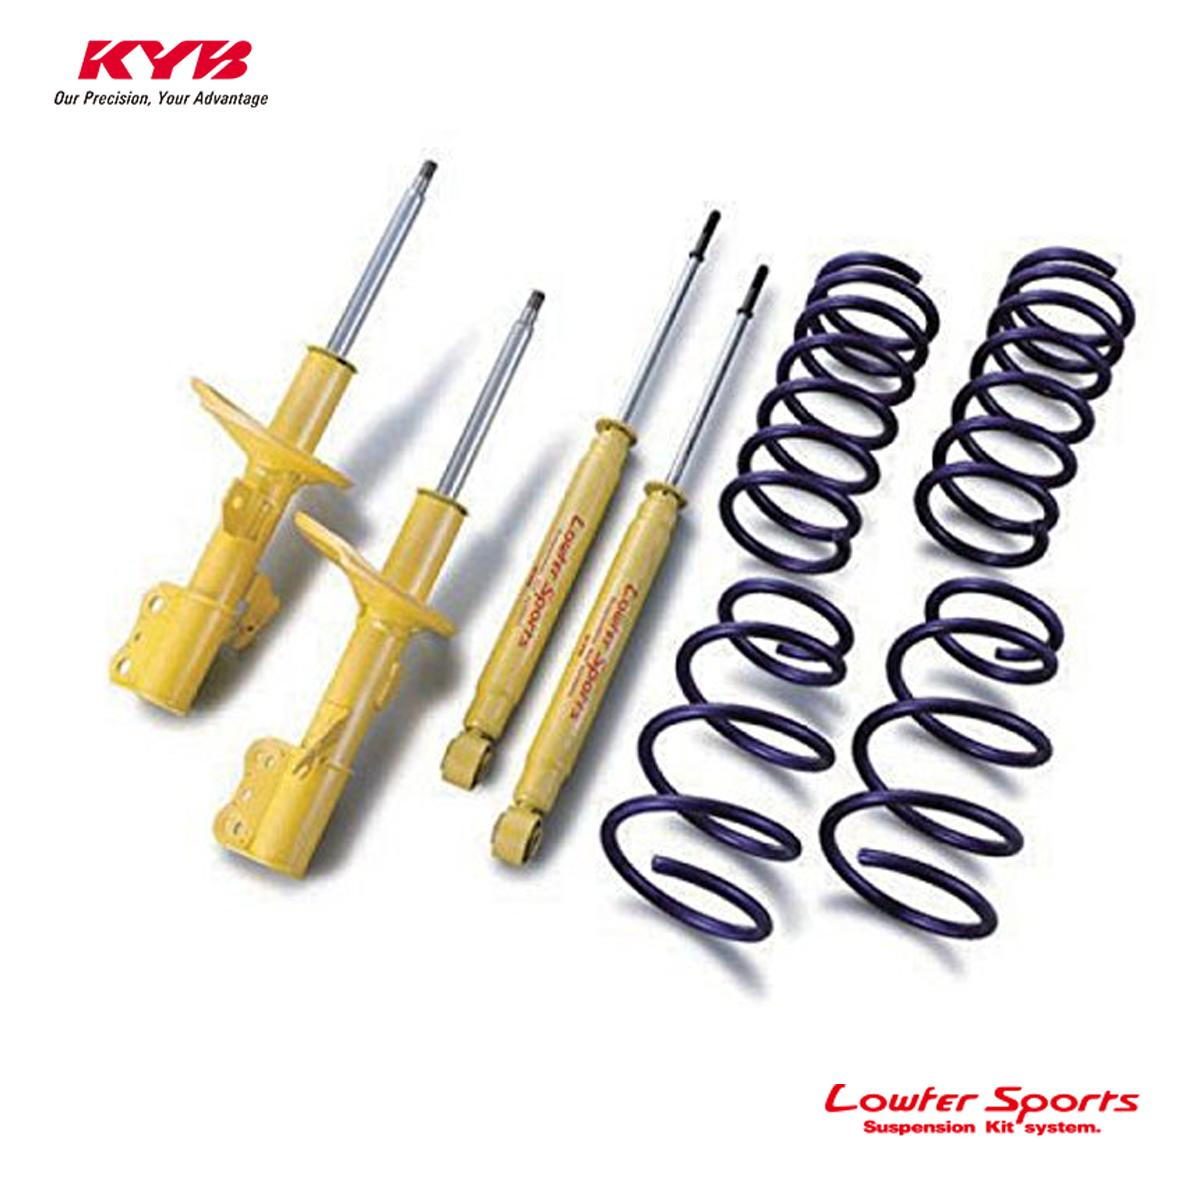 KYB カヤバ フォレスター SG5 ショックアブソーバー サスペンションキット Lowfer Sports LKIT-SG5 配送先条件有り